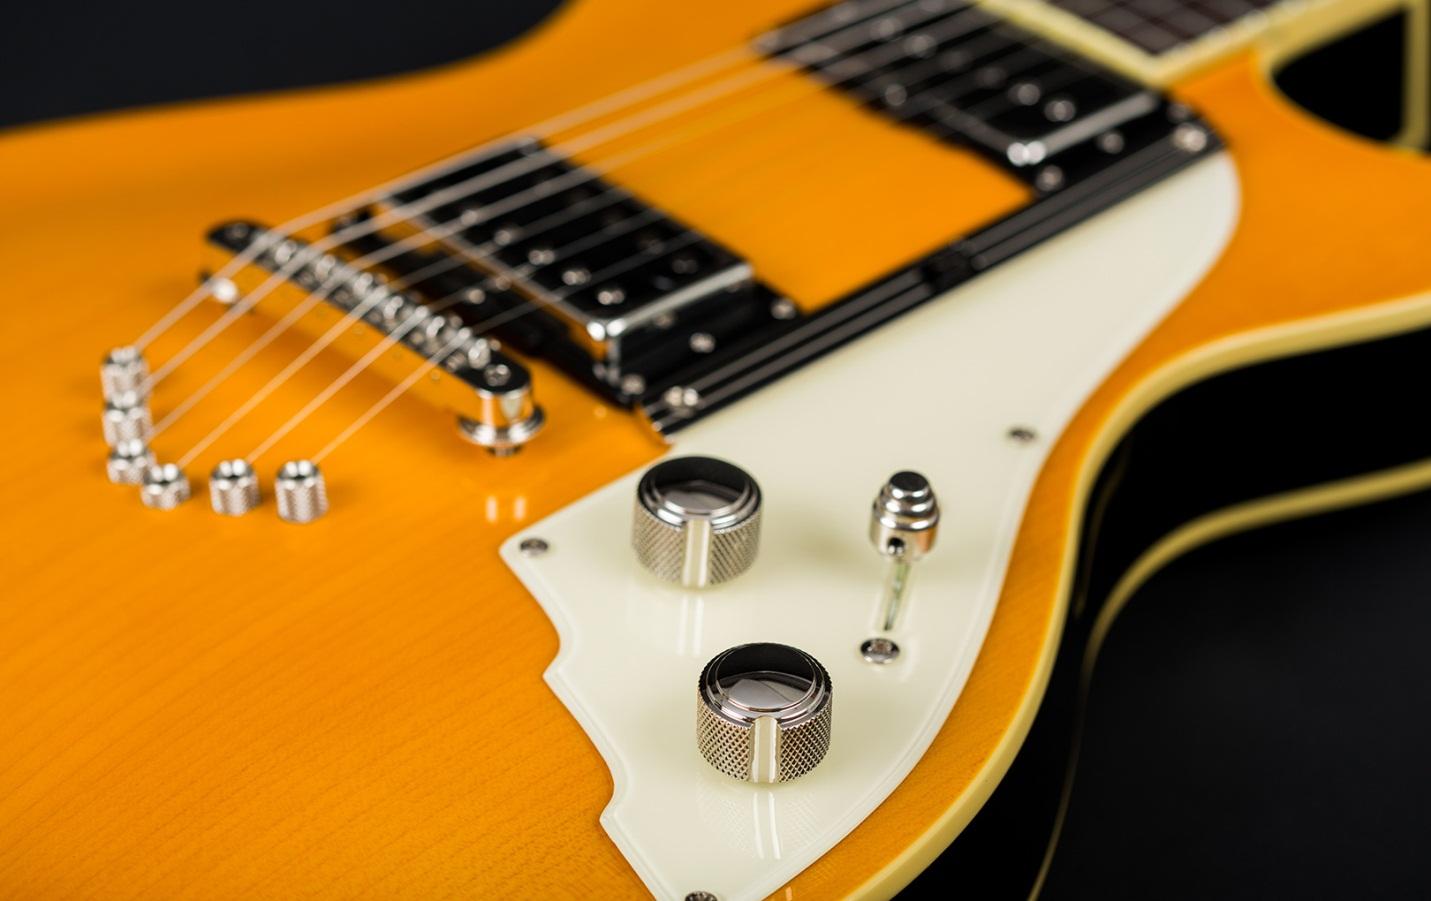 цельнокорпусная гитара 49er